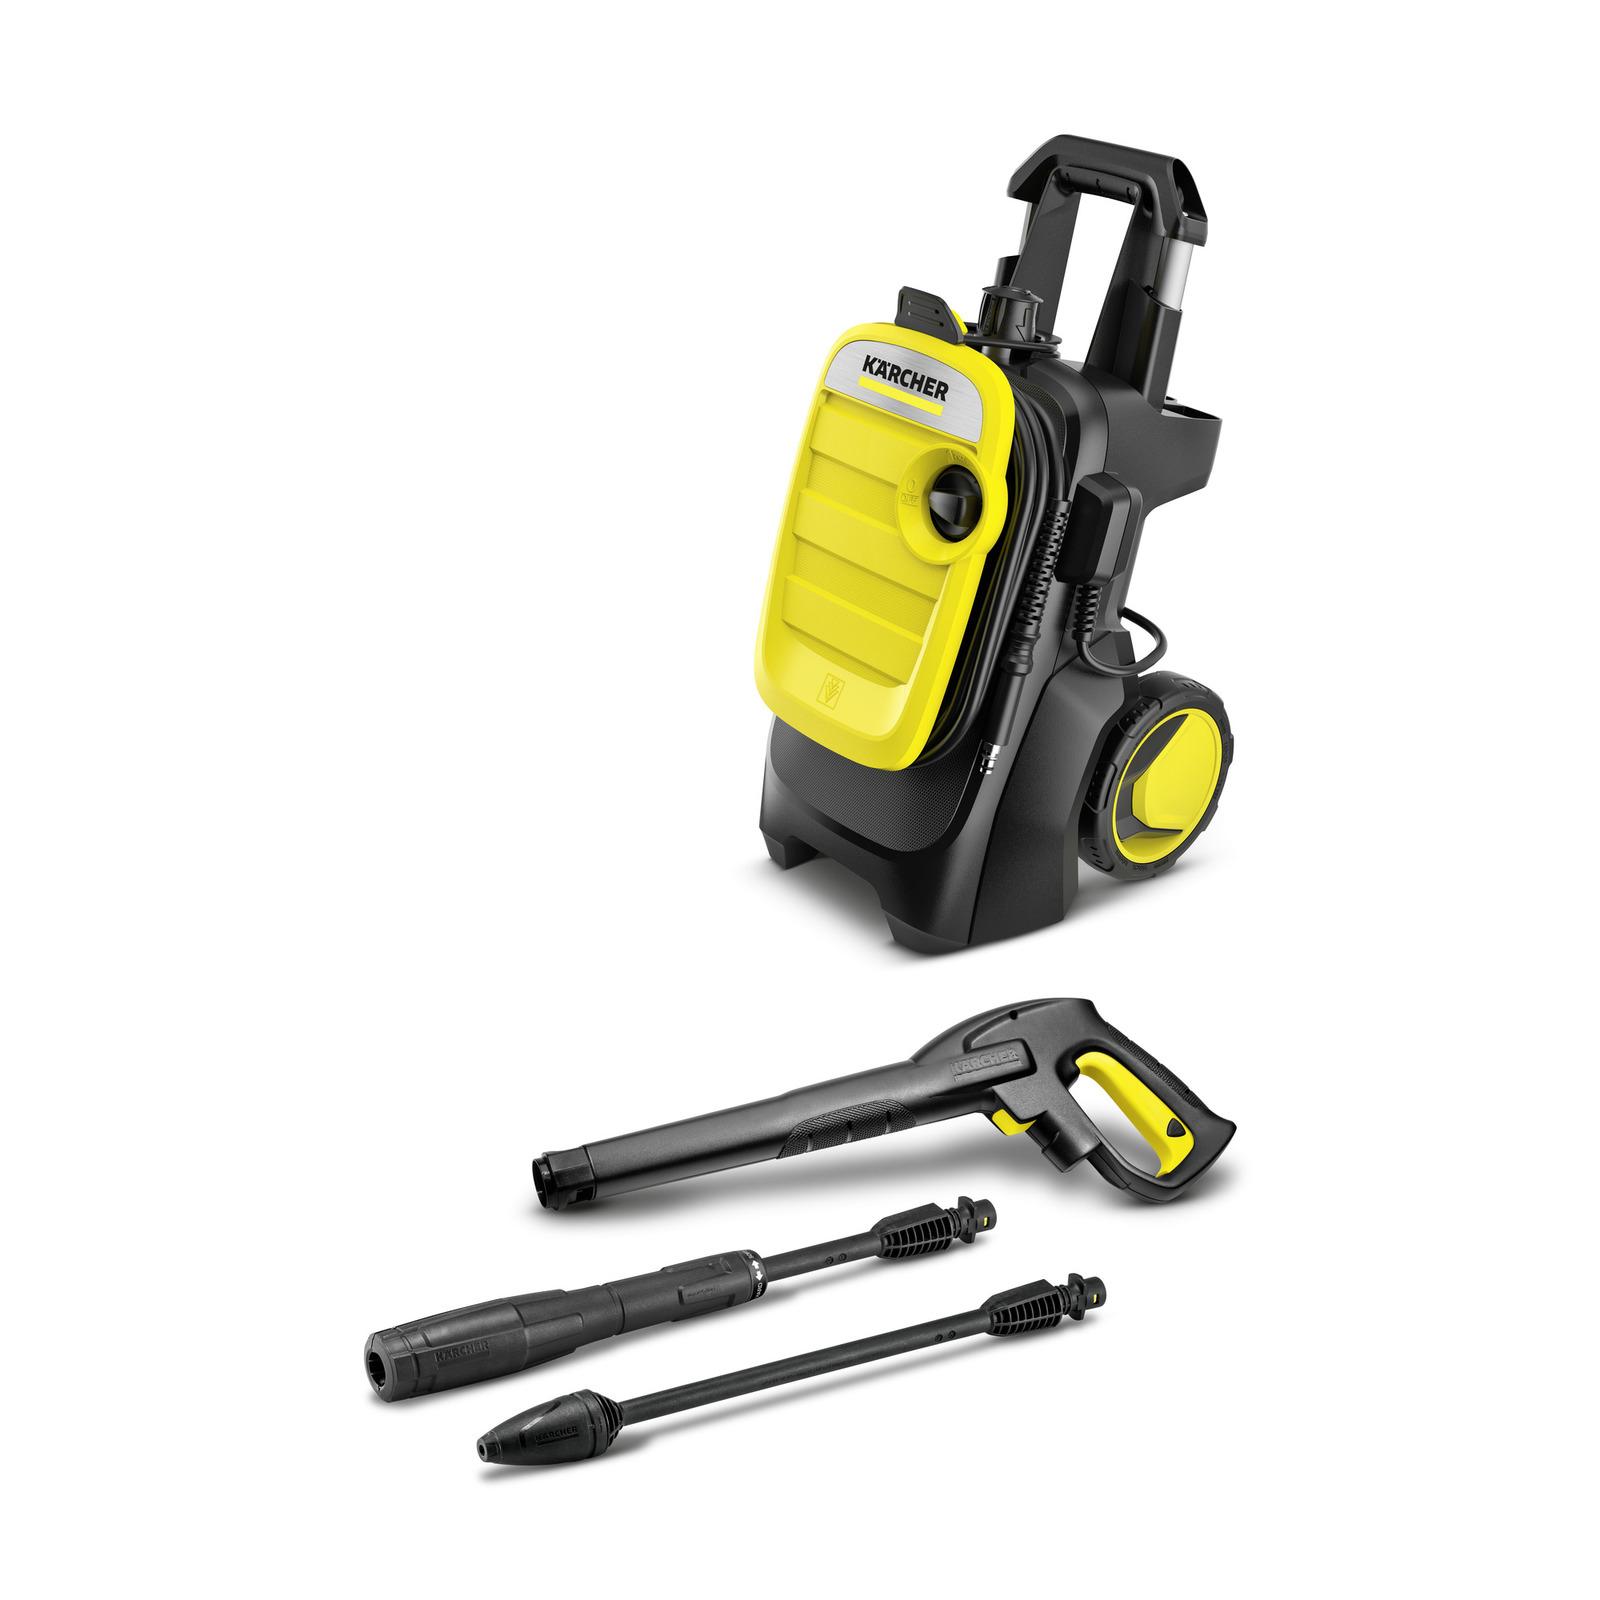 KARCHER 1.630-751.0 - K5 Compact Pressure Washer